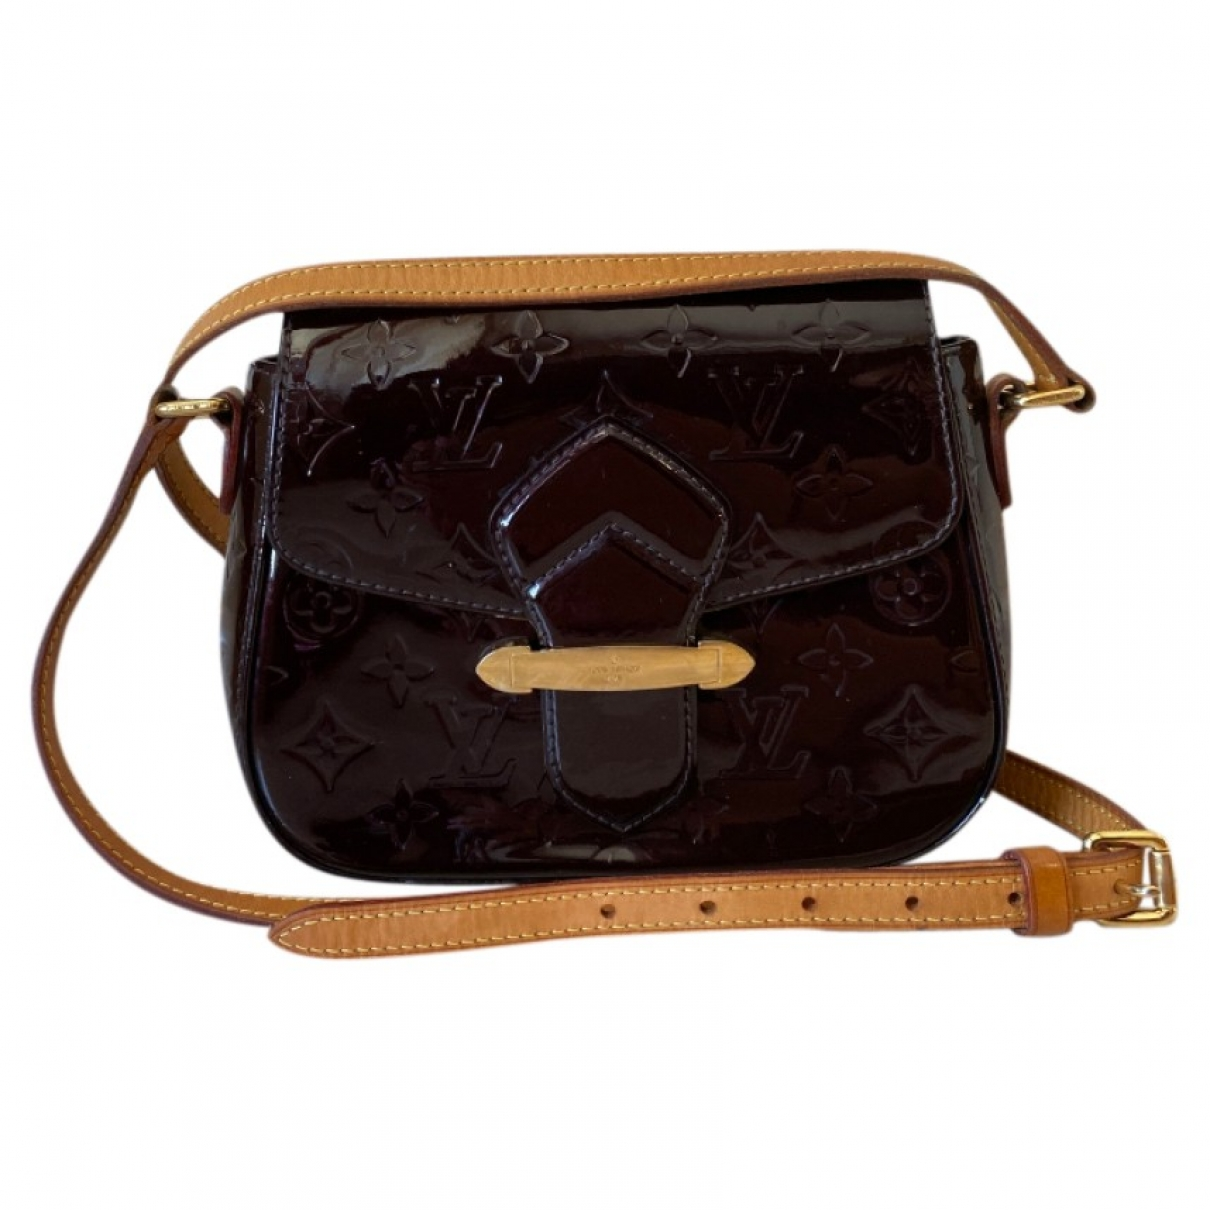 Louis Vuitton Bellflower Handtasche in  Bordeauxrot Lackleder